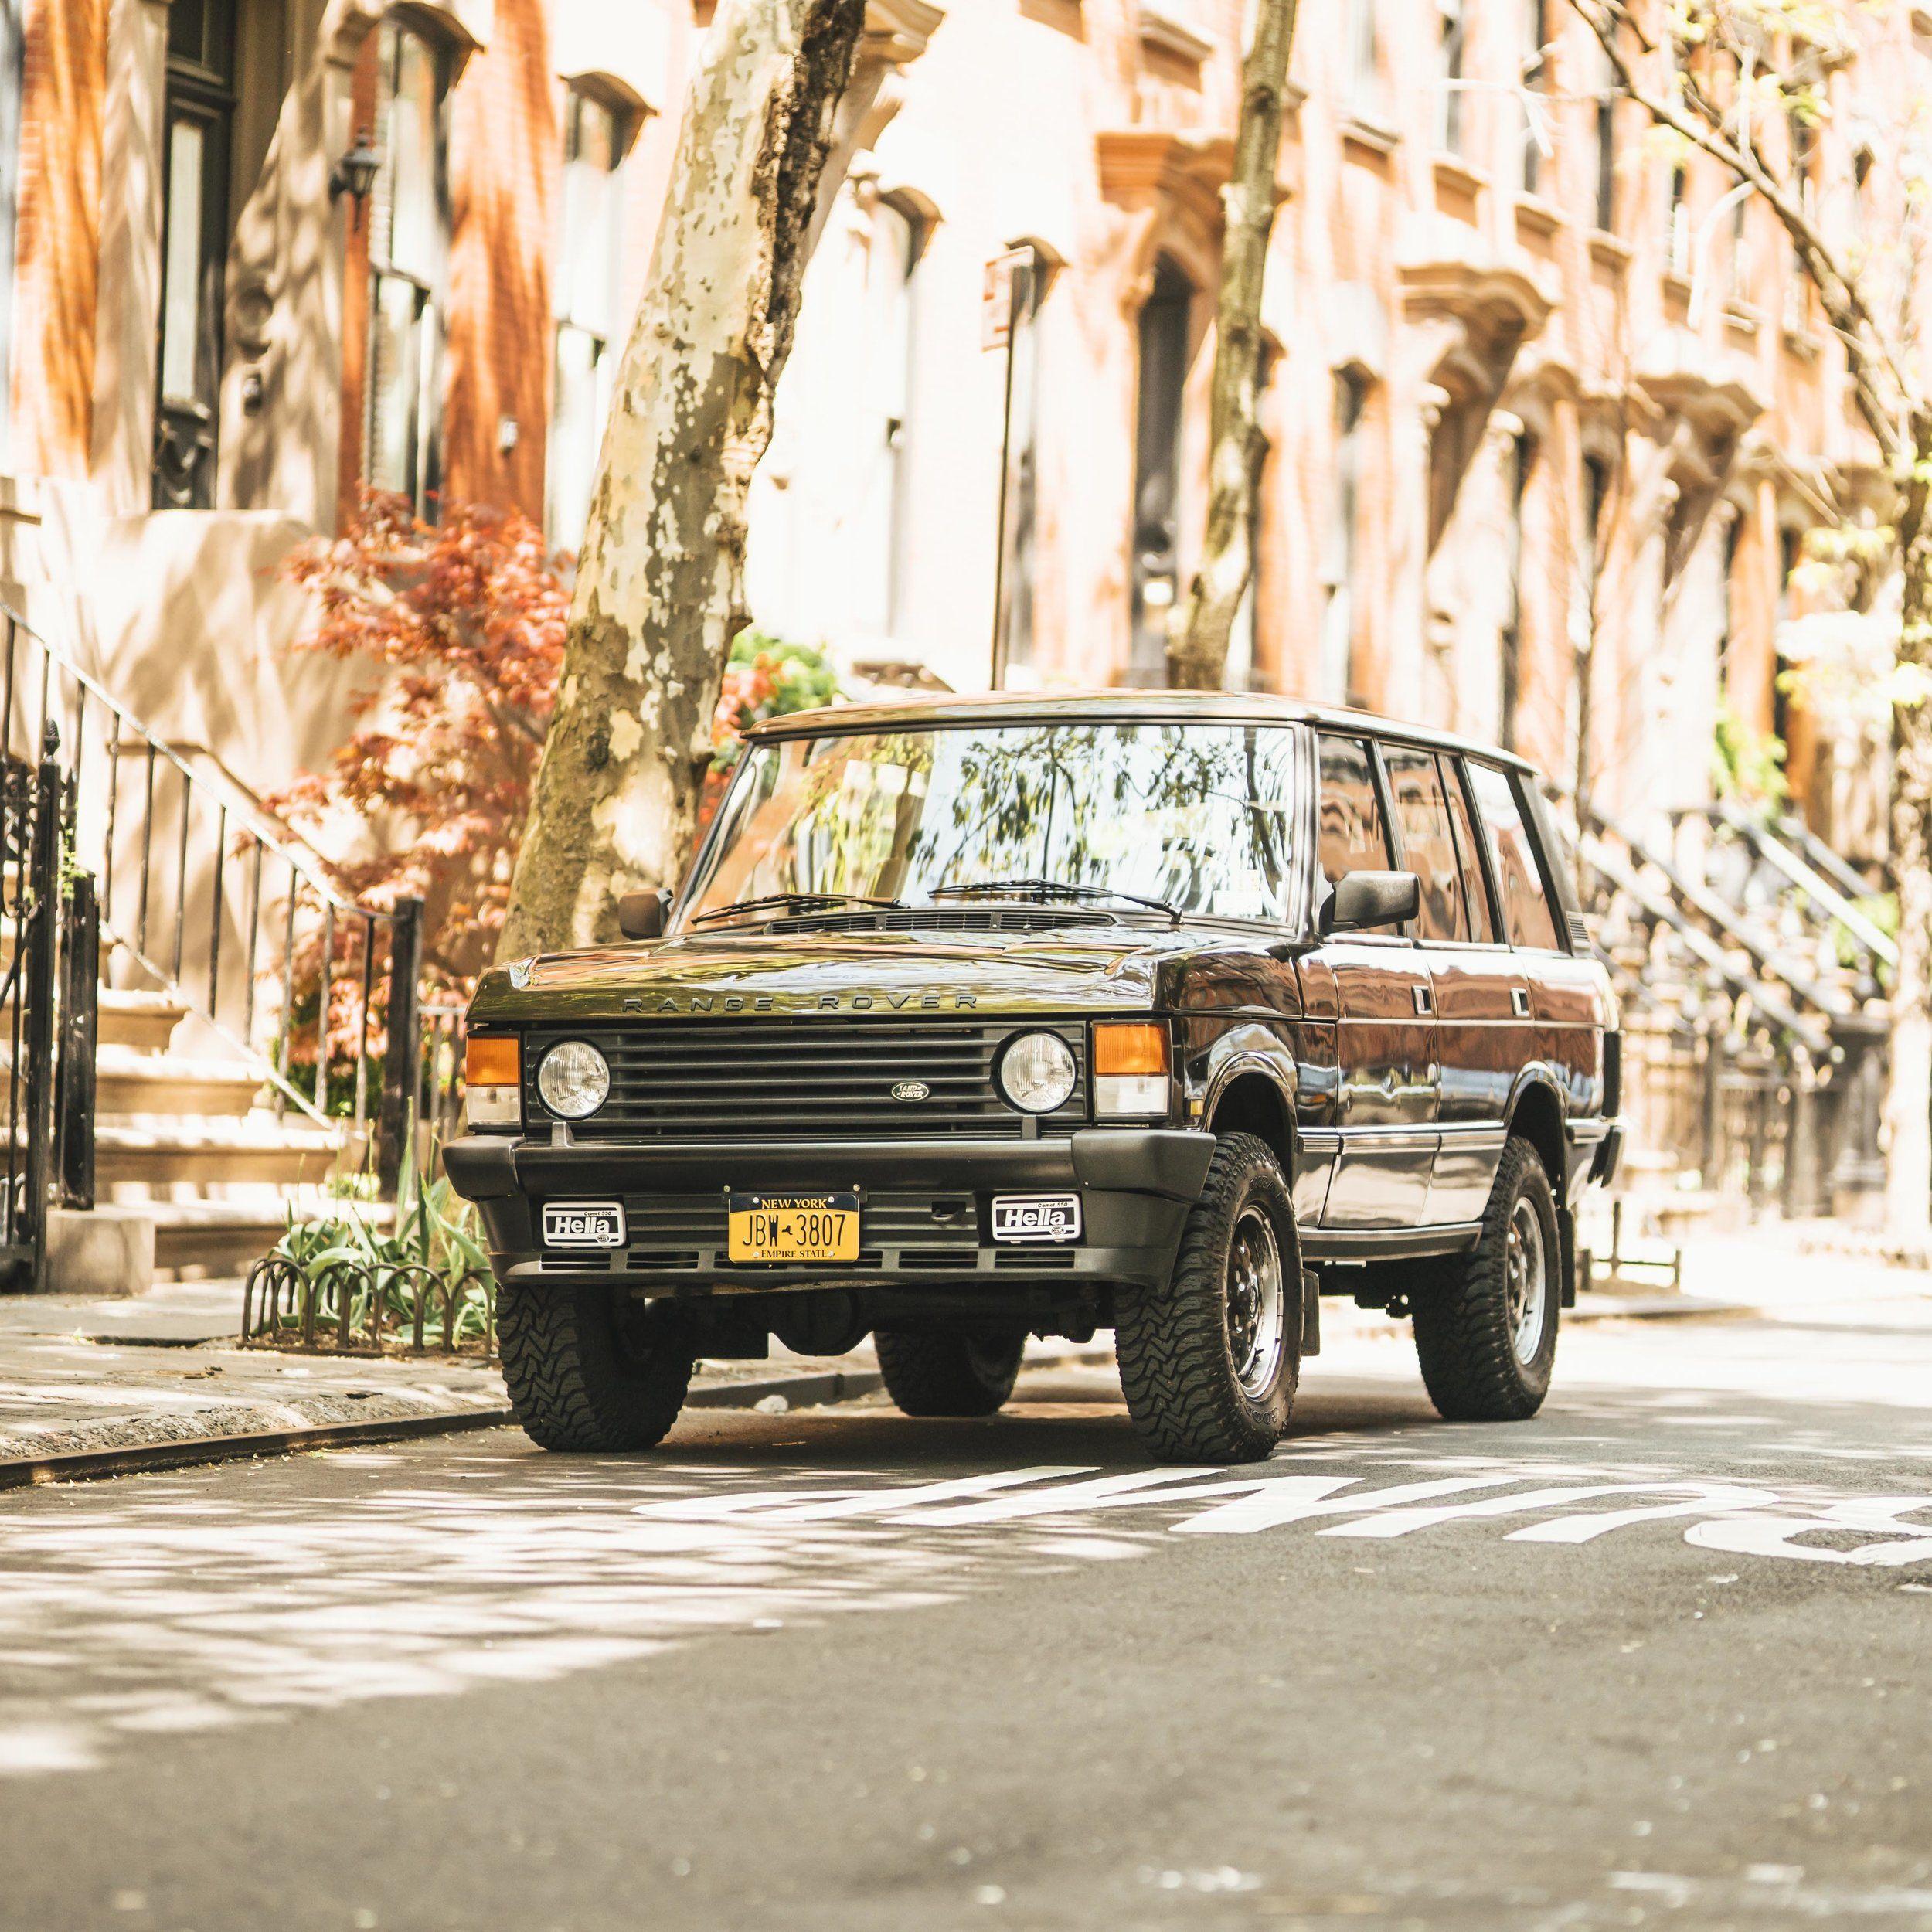 Araba Için 10 Fikir Araba Range Rover Off Road